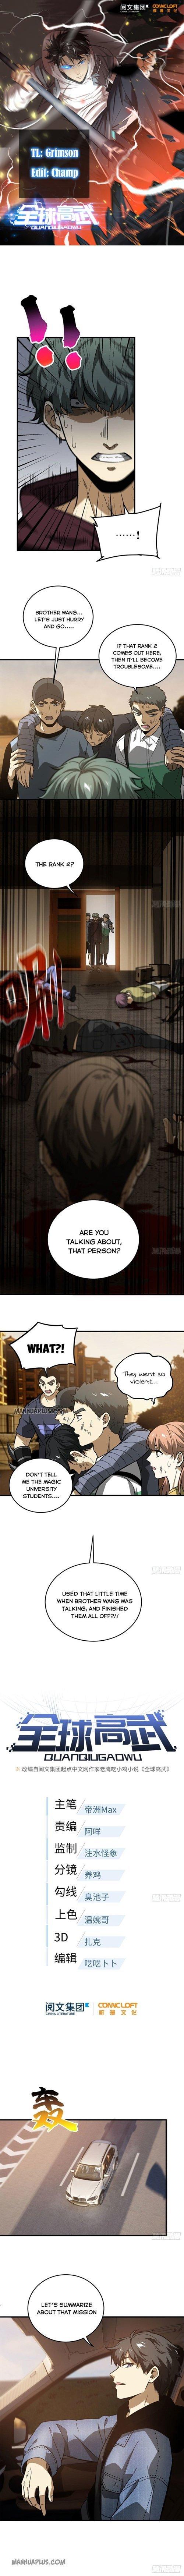 Manga Global Martial Arts - Chapter 71 Page 1